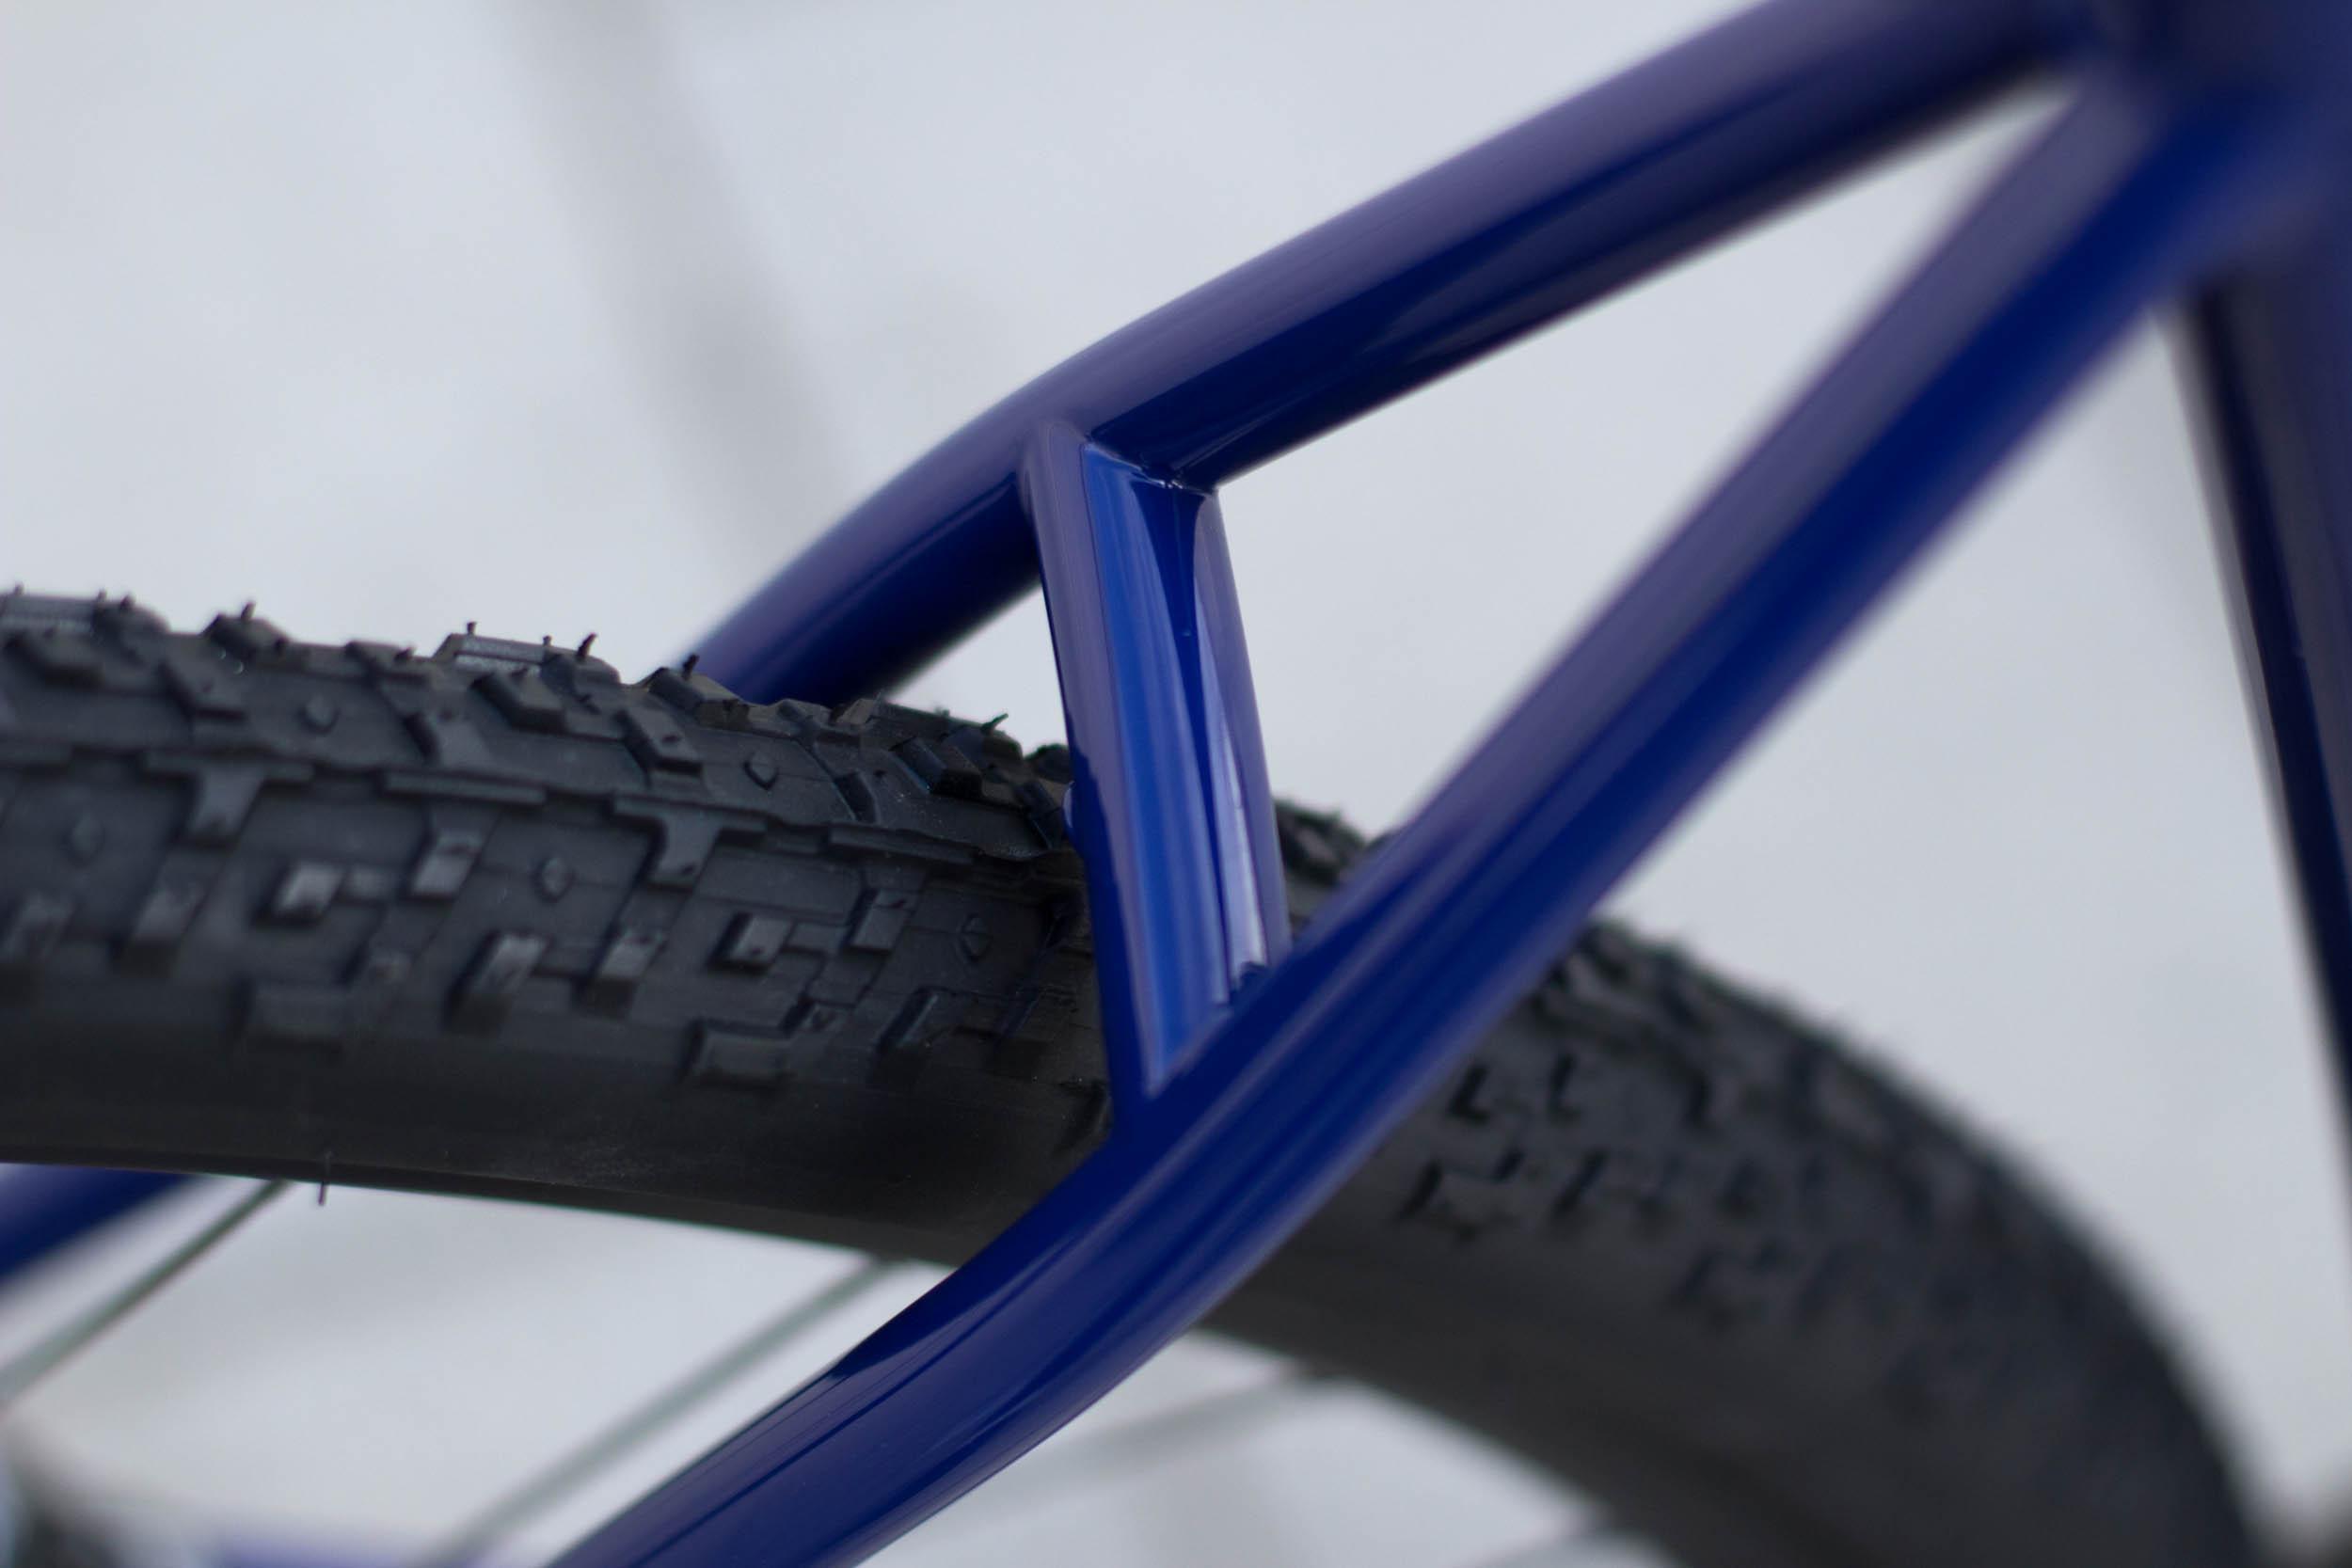 quirk_cycles_peter_lunt_kegety_01.jpg